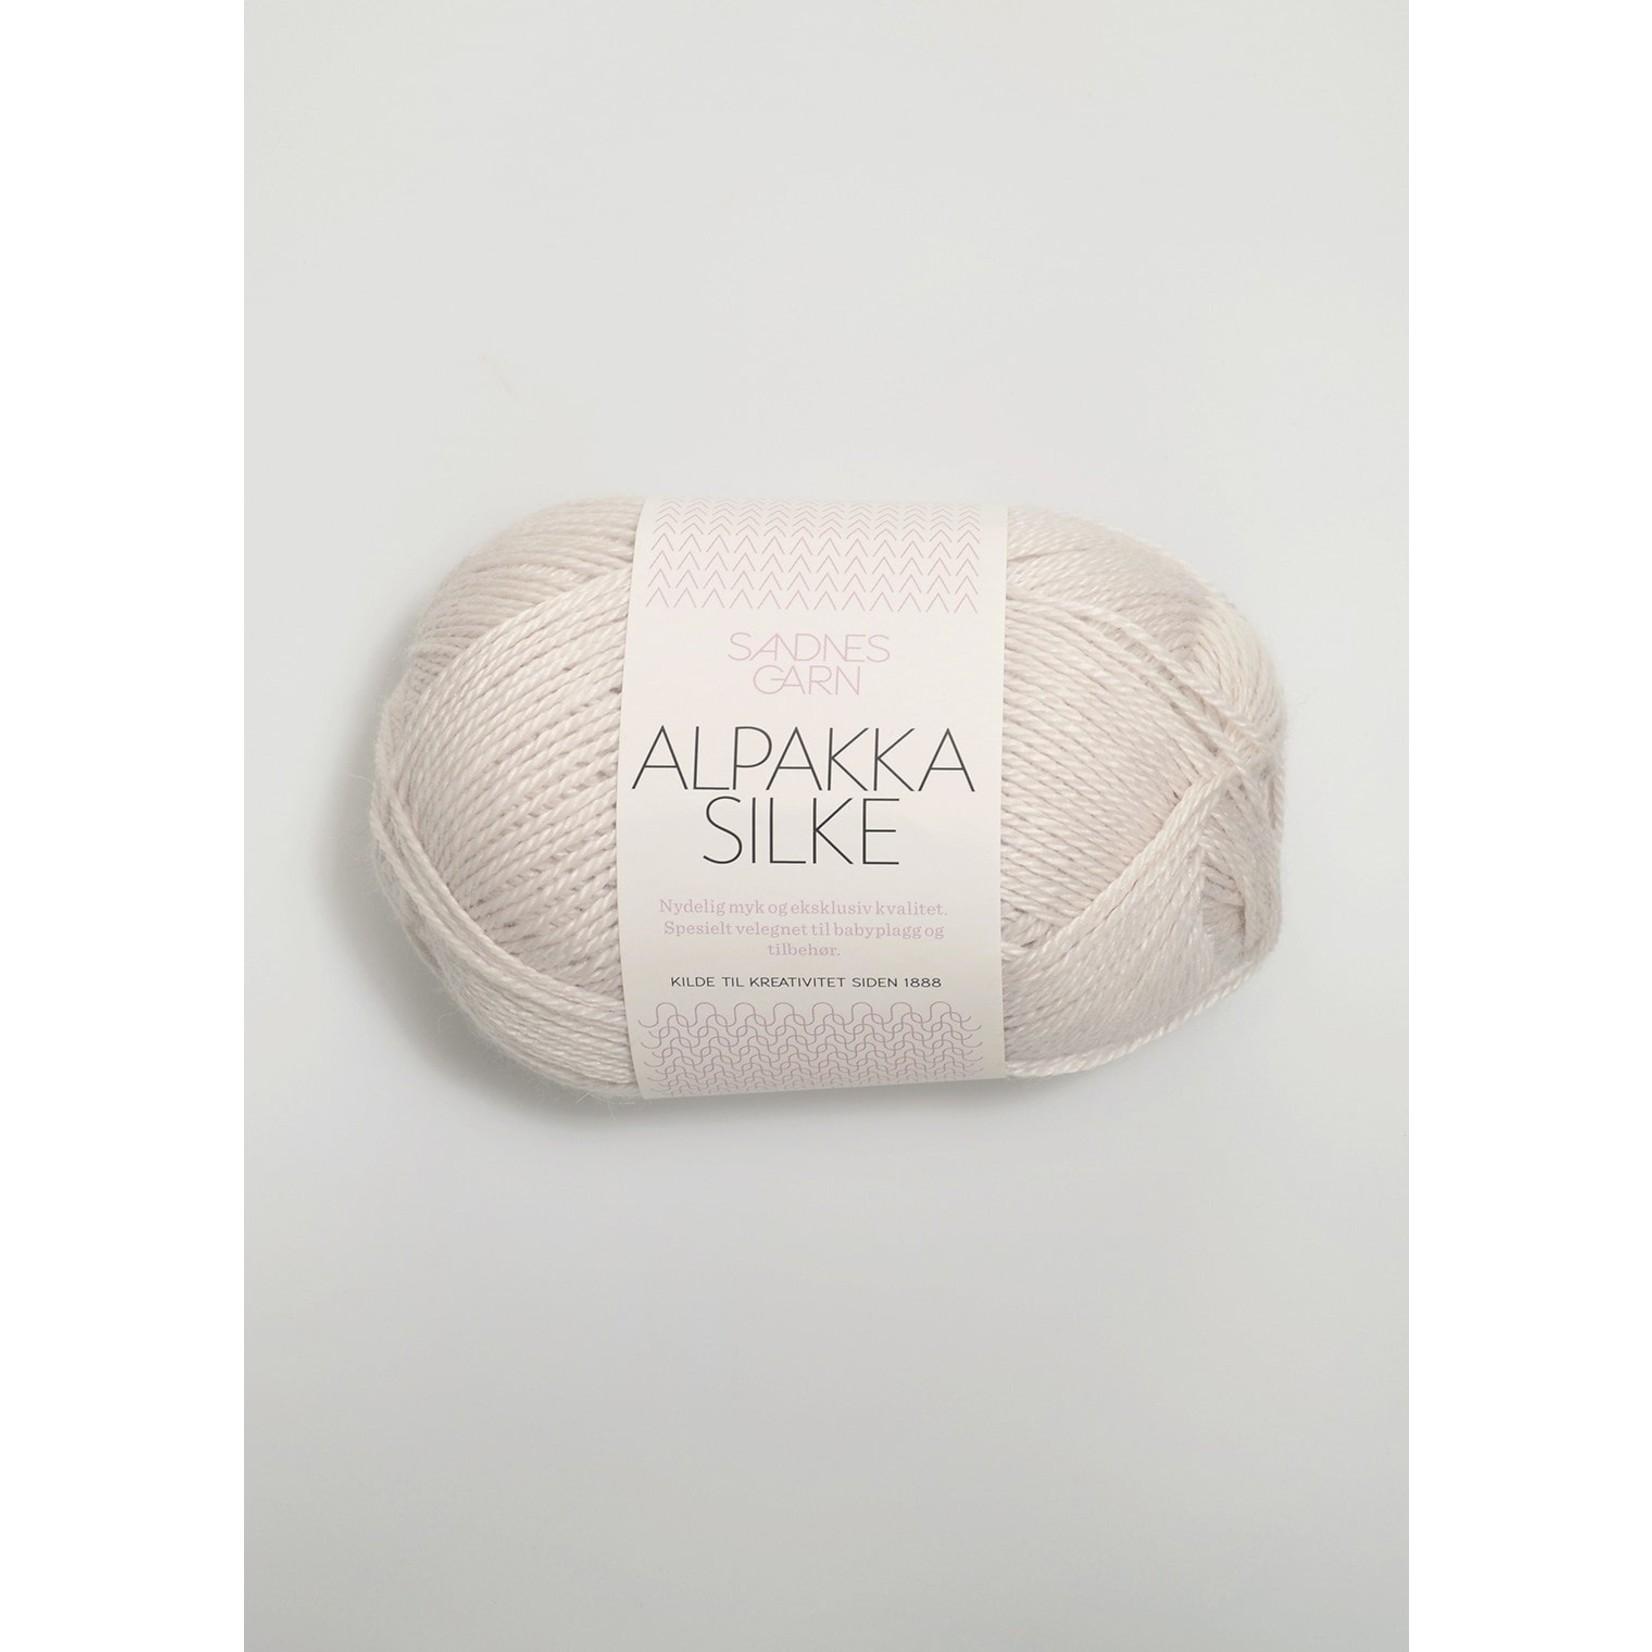 Sandnes Garn Alpakka Silke, 1015, Putty